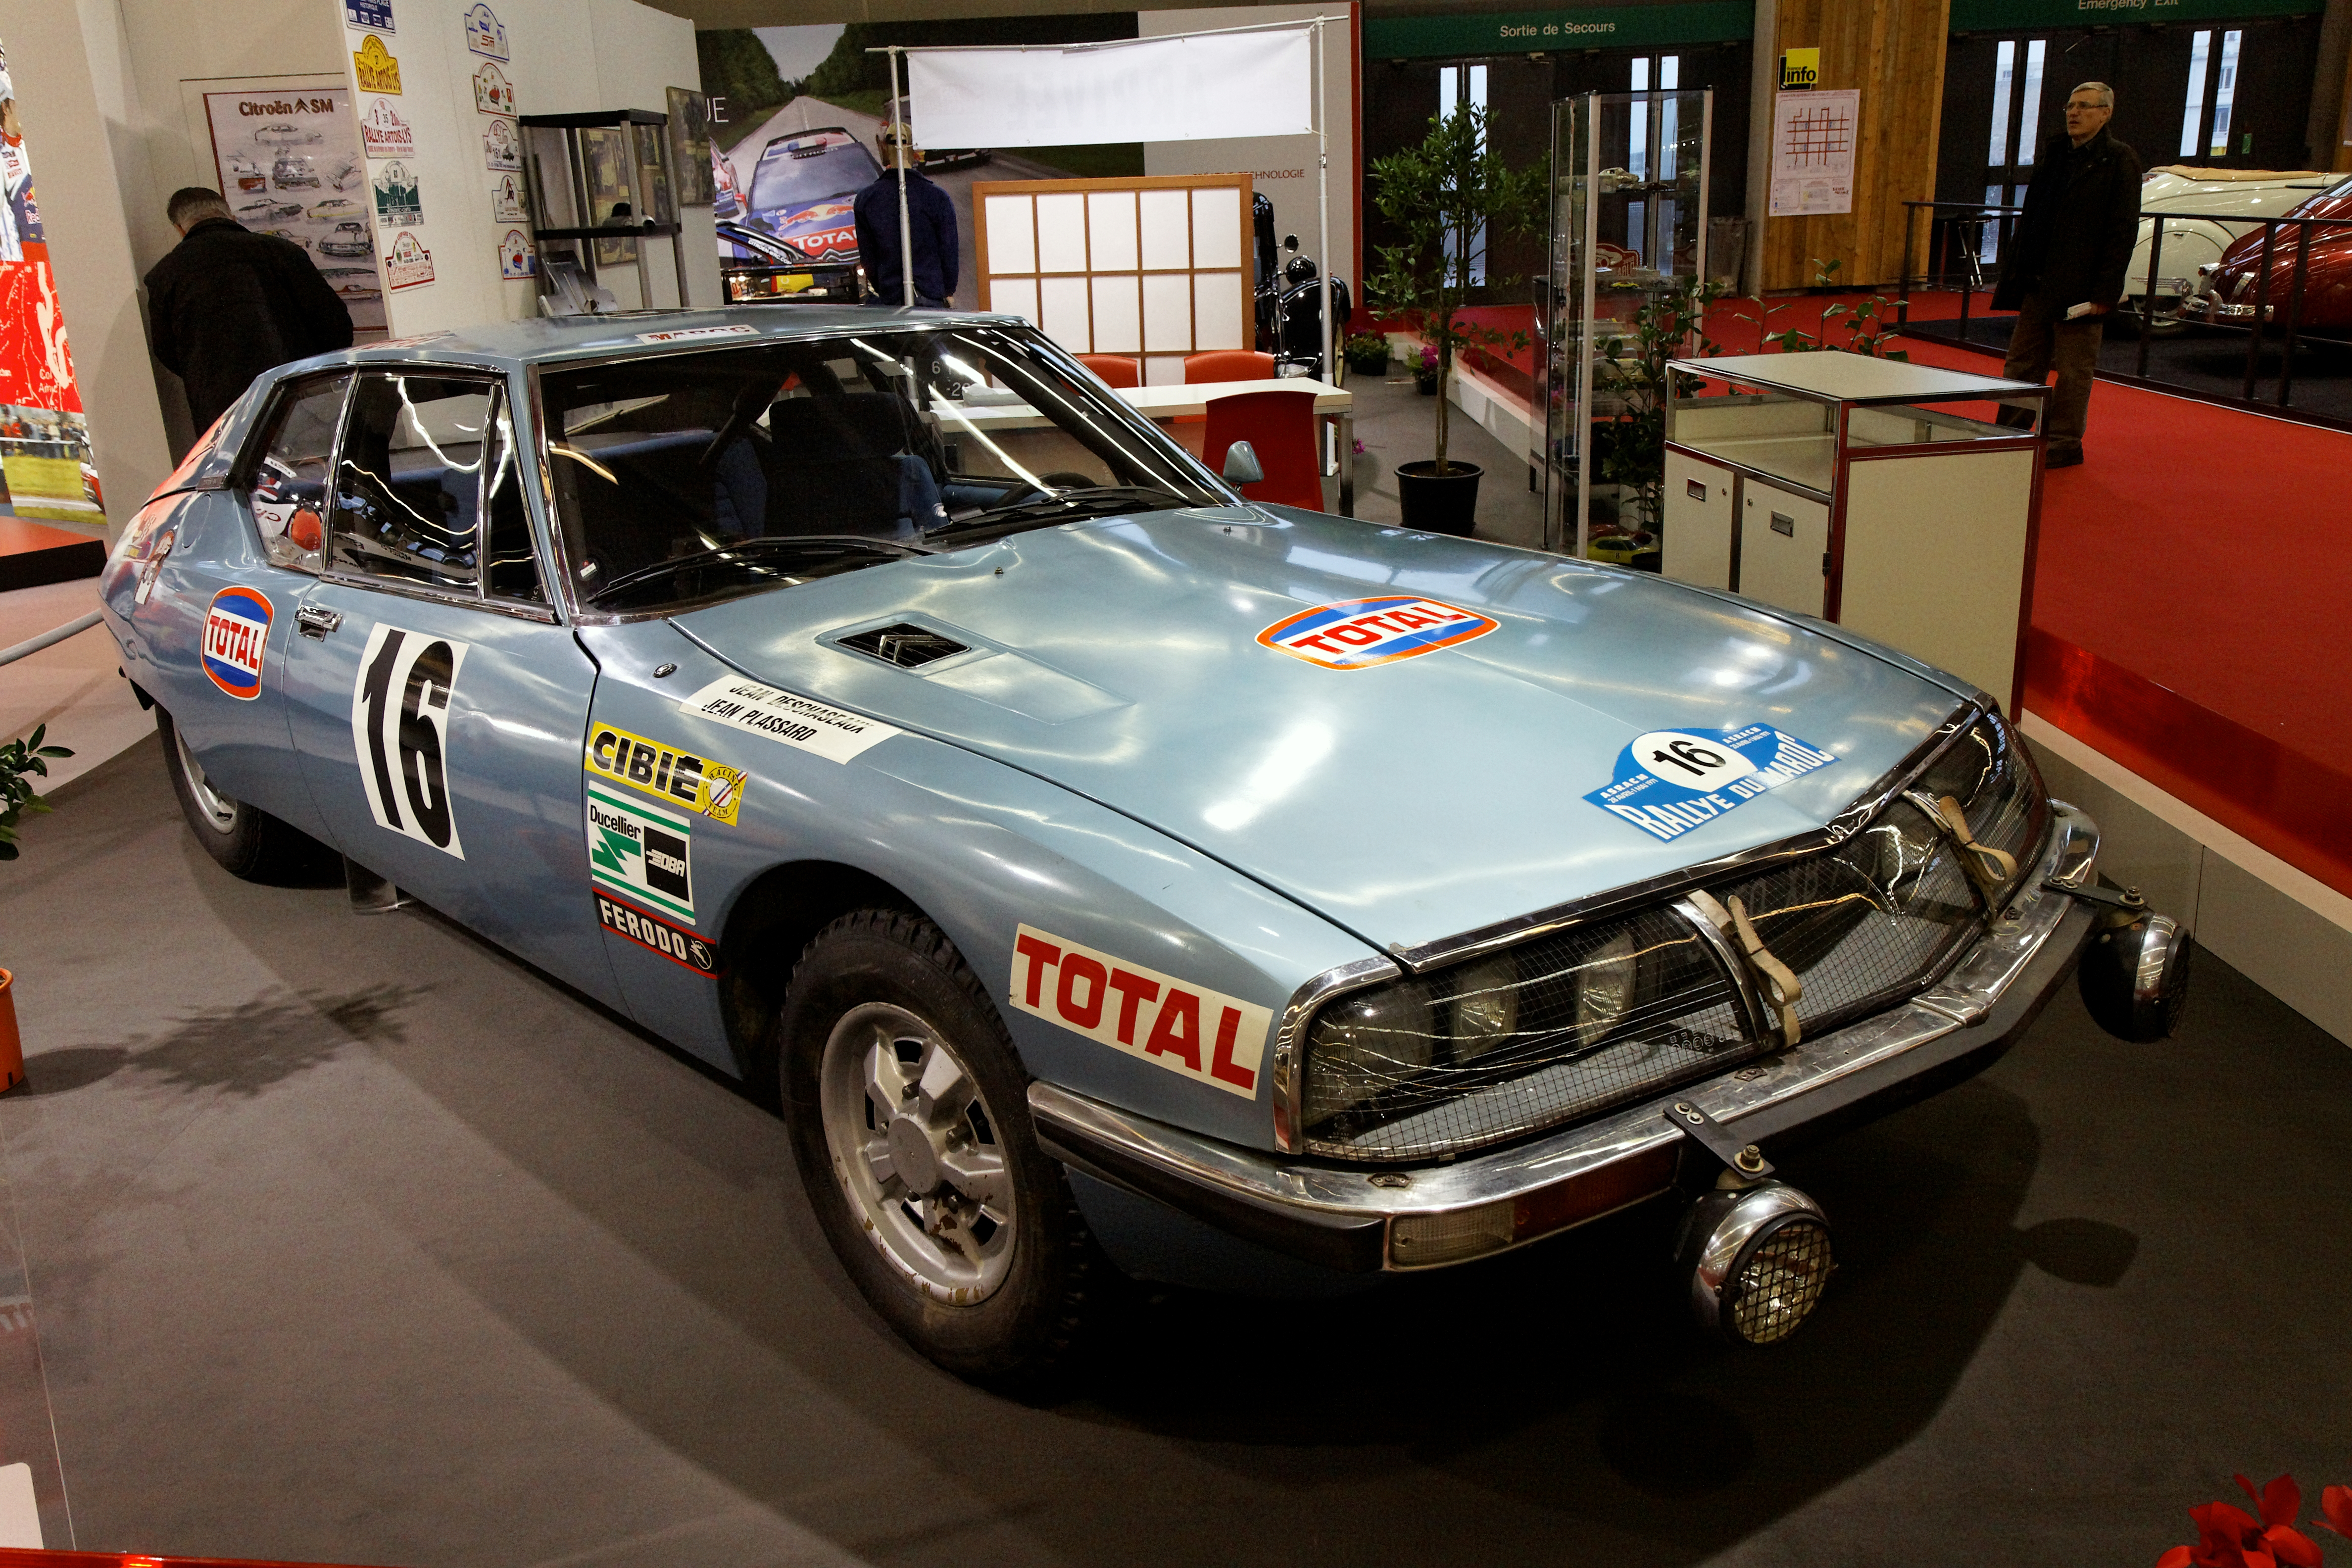 R%C3%A9tromobile_2011_-_Citro%C3%ABn_SM_Rallye_du_Maroc_1971_-_003.jpg